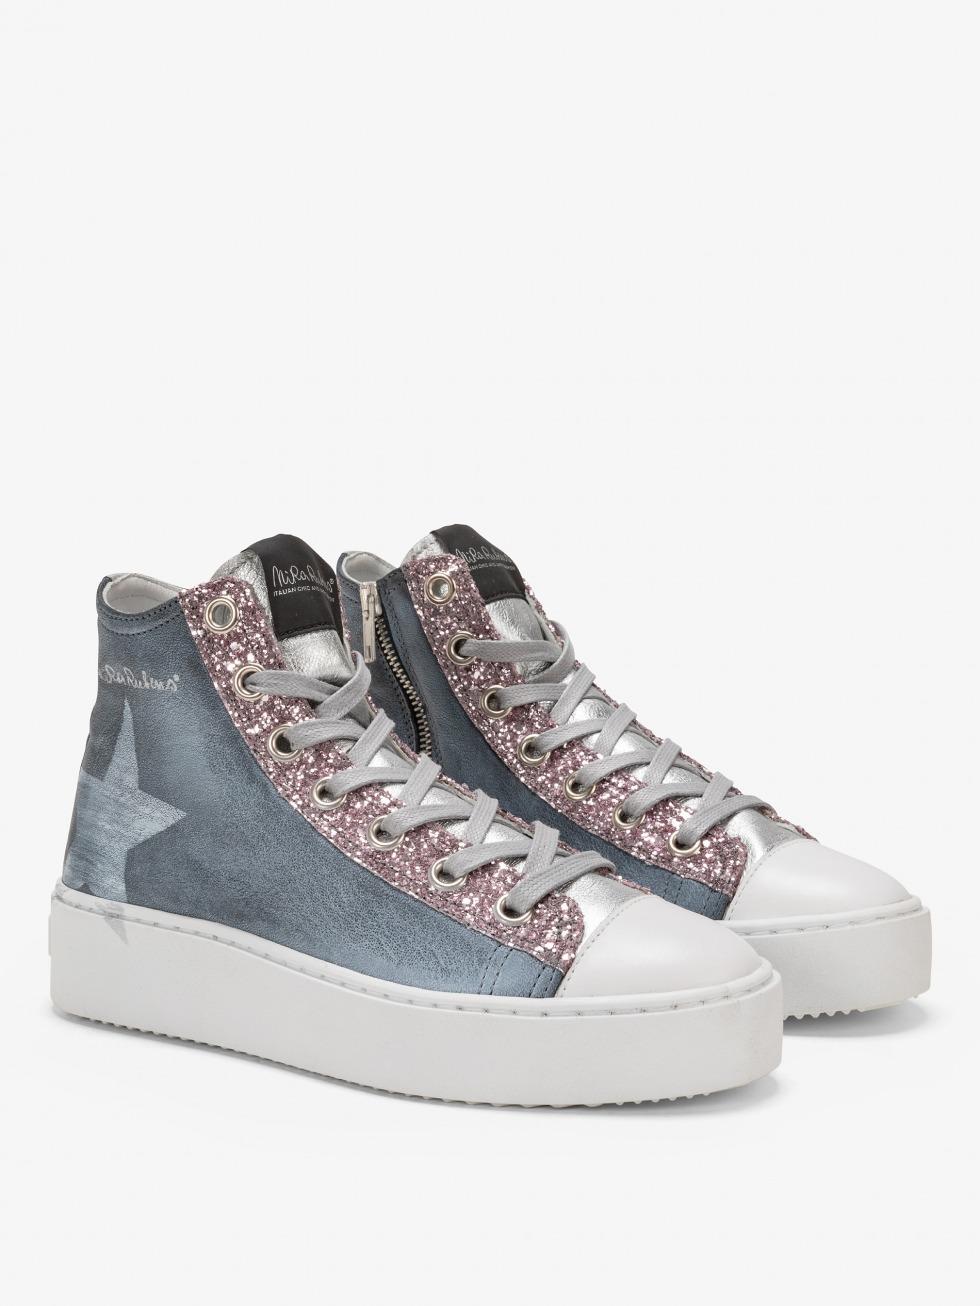 Long Island Sneakers Portofino - Star